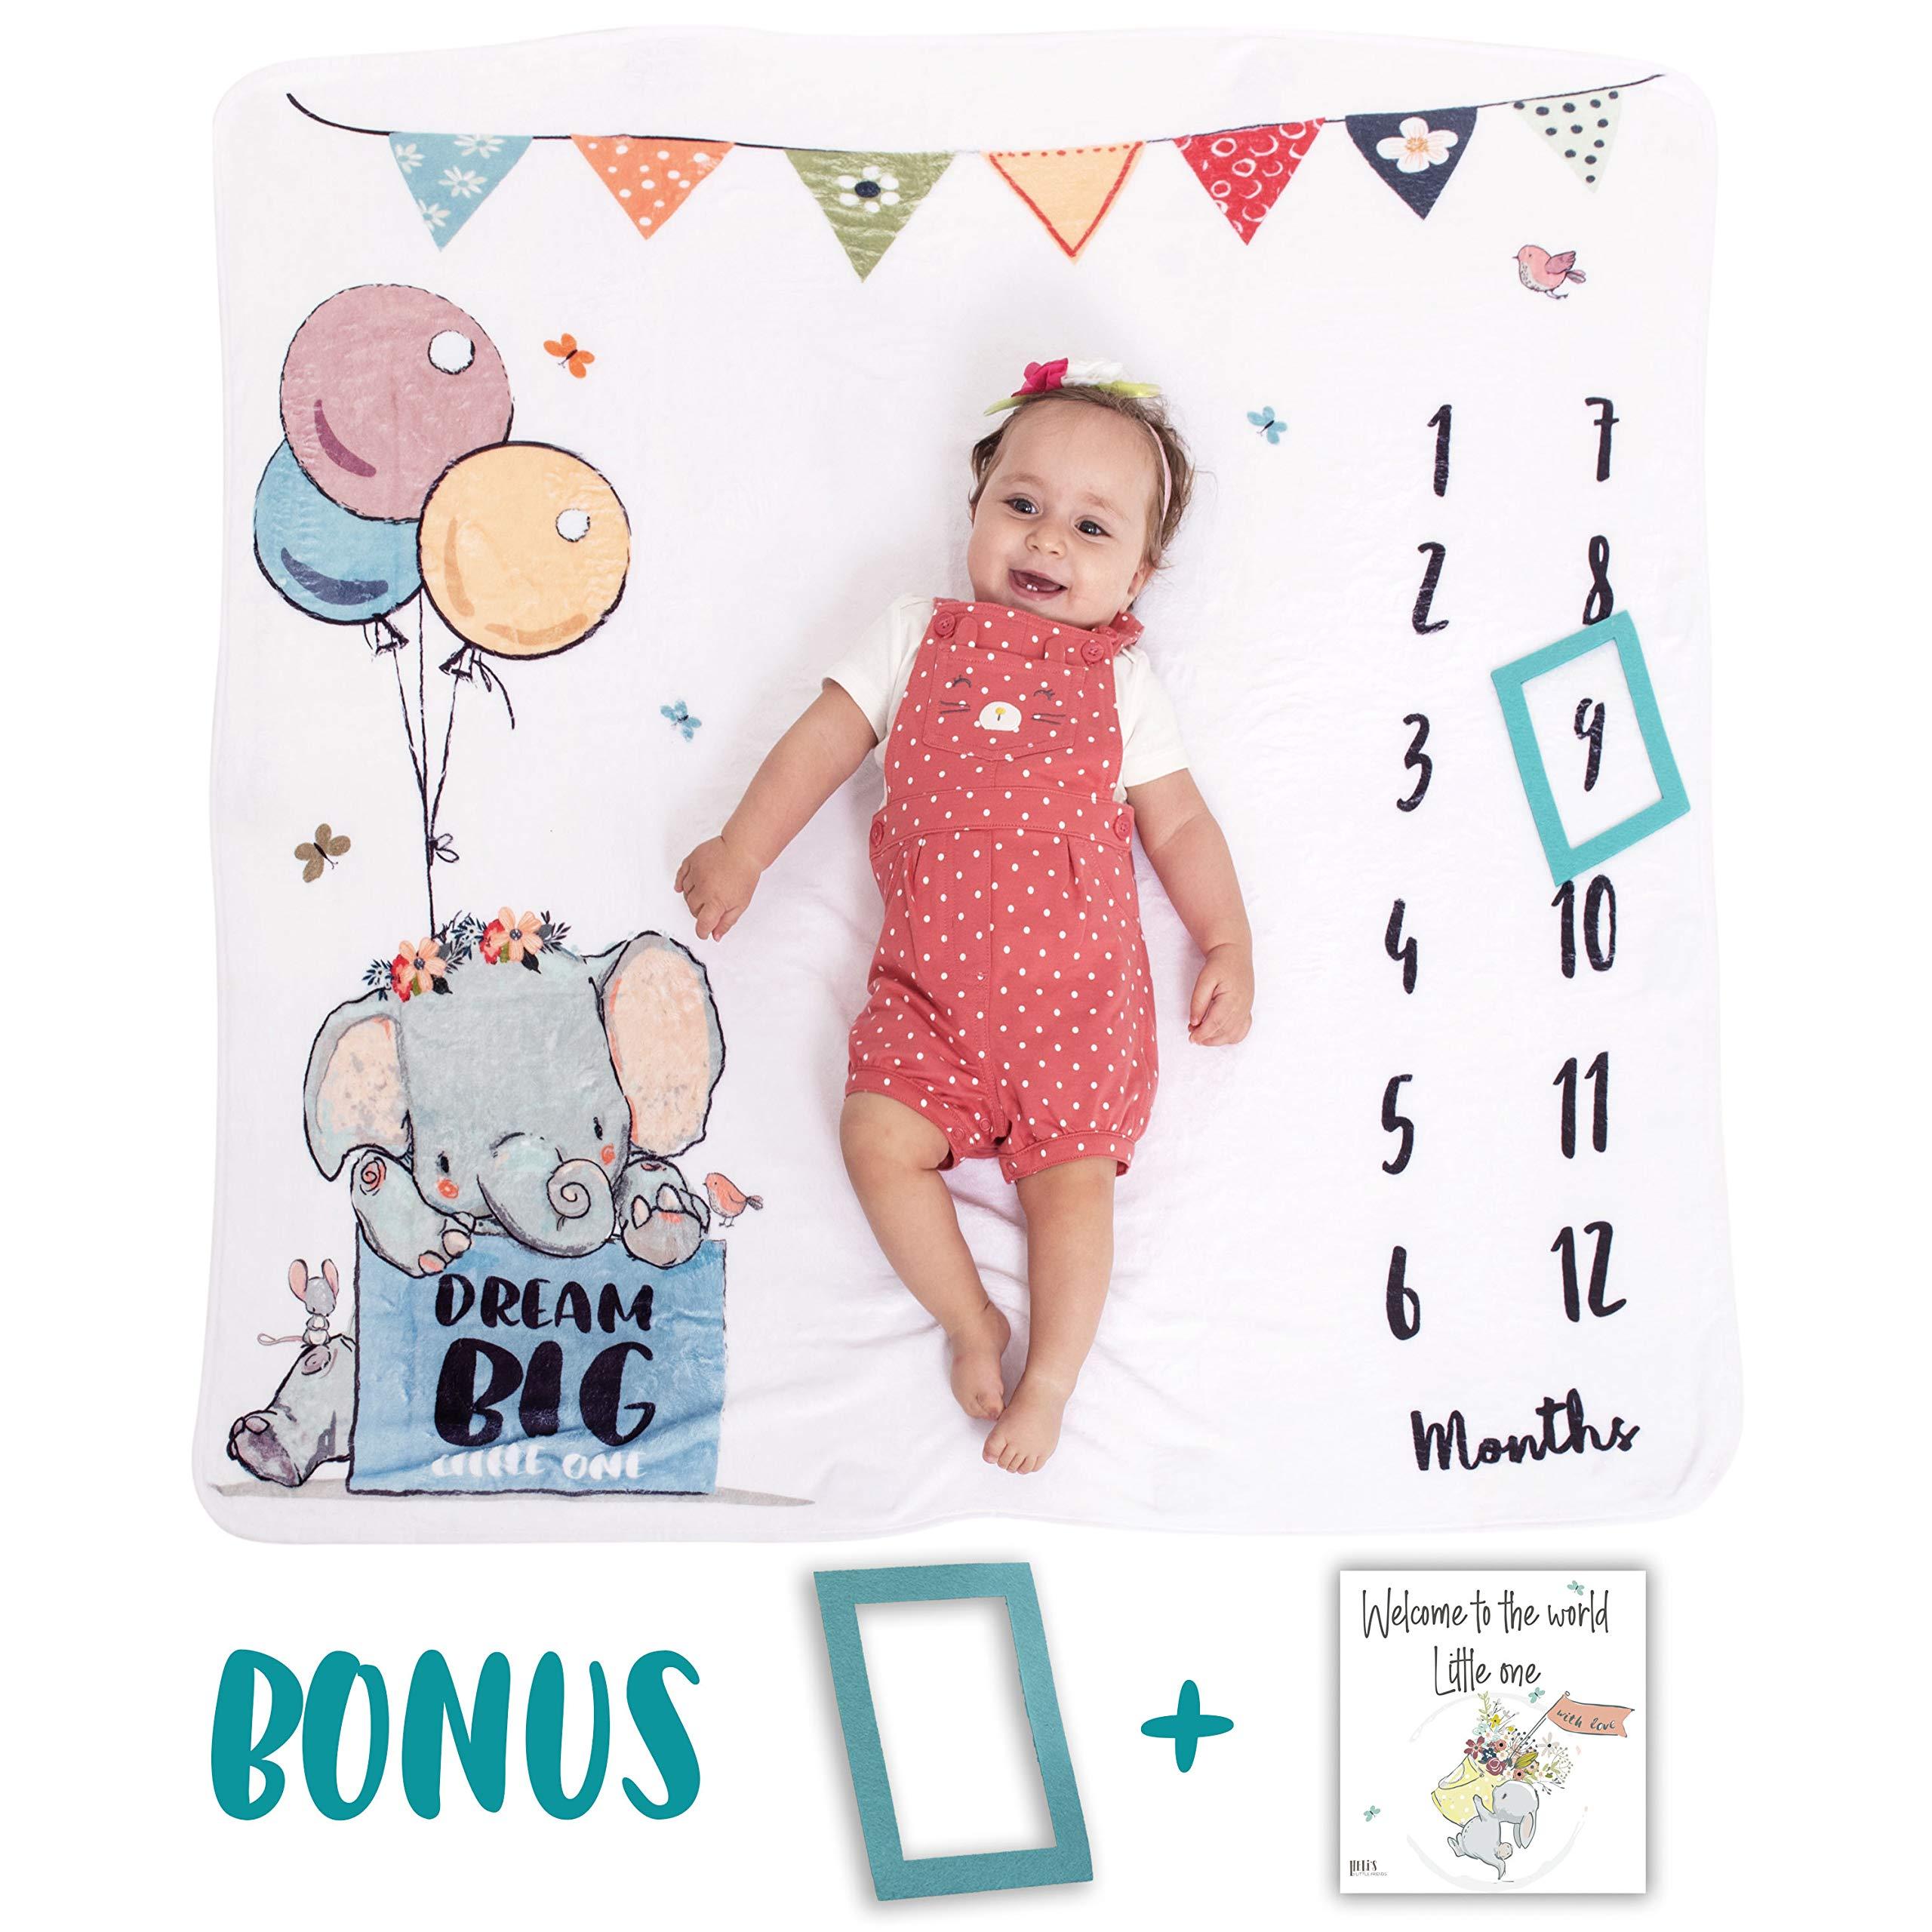 Baby Monthly Milestone Blanket   Premium Soft Plush Fleece   Photo Prop for Newborn Boy & Girl   Unique Animal Design  47'' x 47''  Newborn Unique Gifts   New Moms Baby Shower Gift